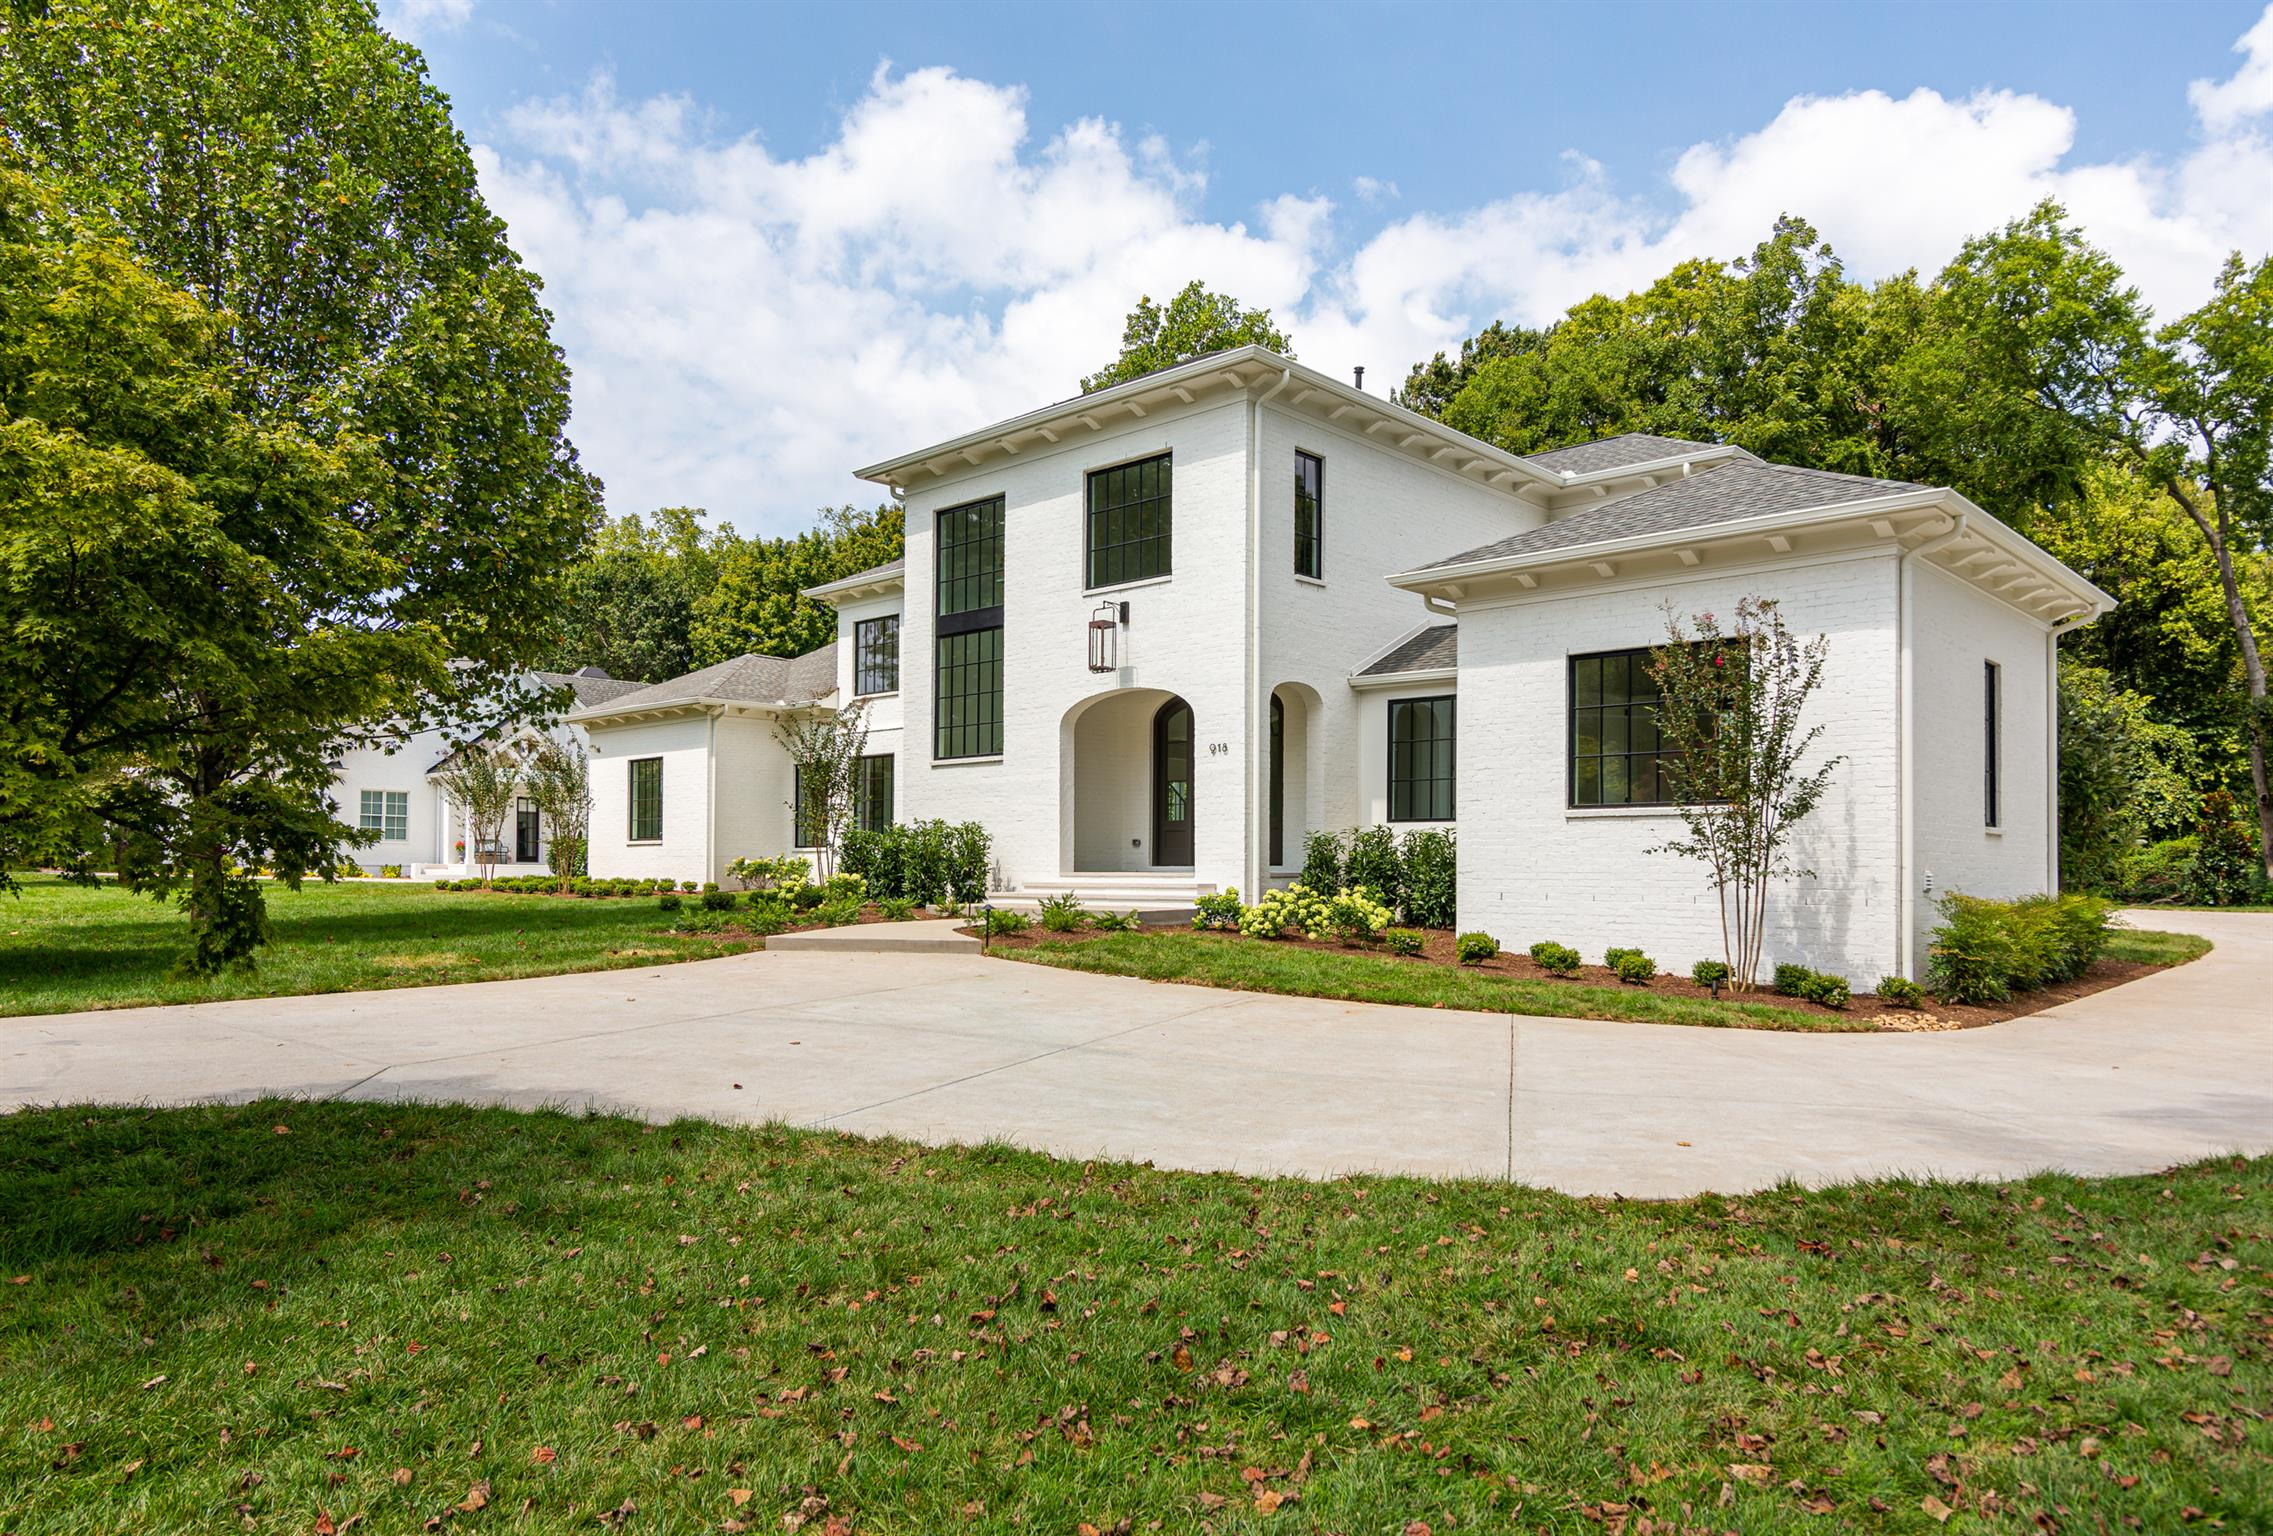 918 Evans Rd, Nashville, TN 37204 - Nashville, TN real estate listing